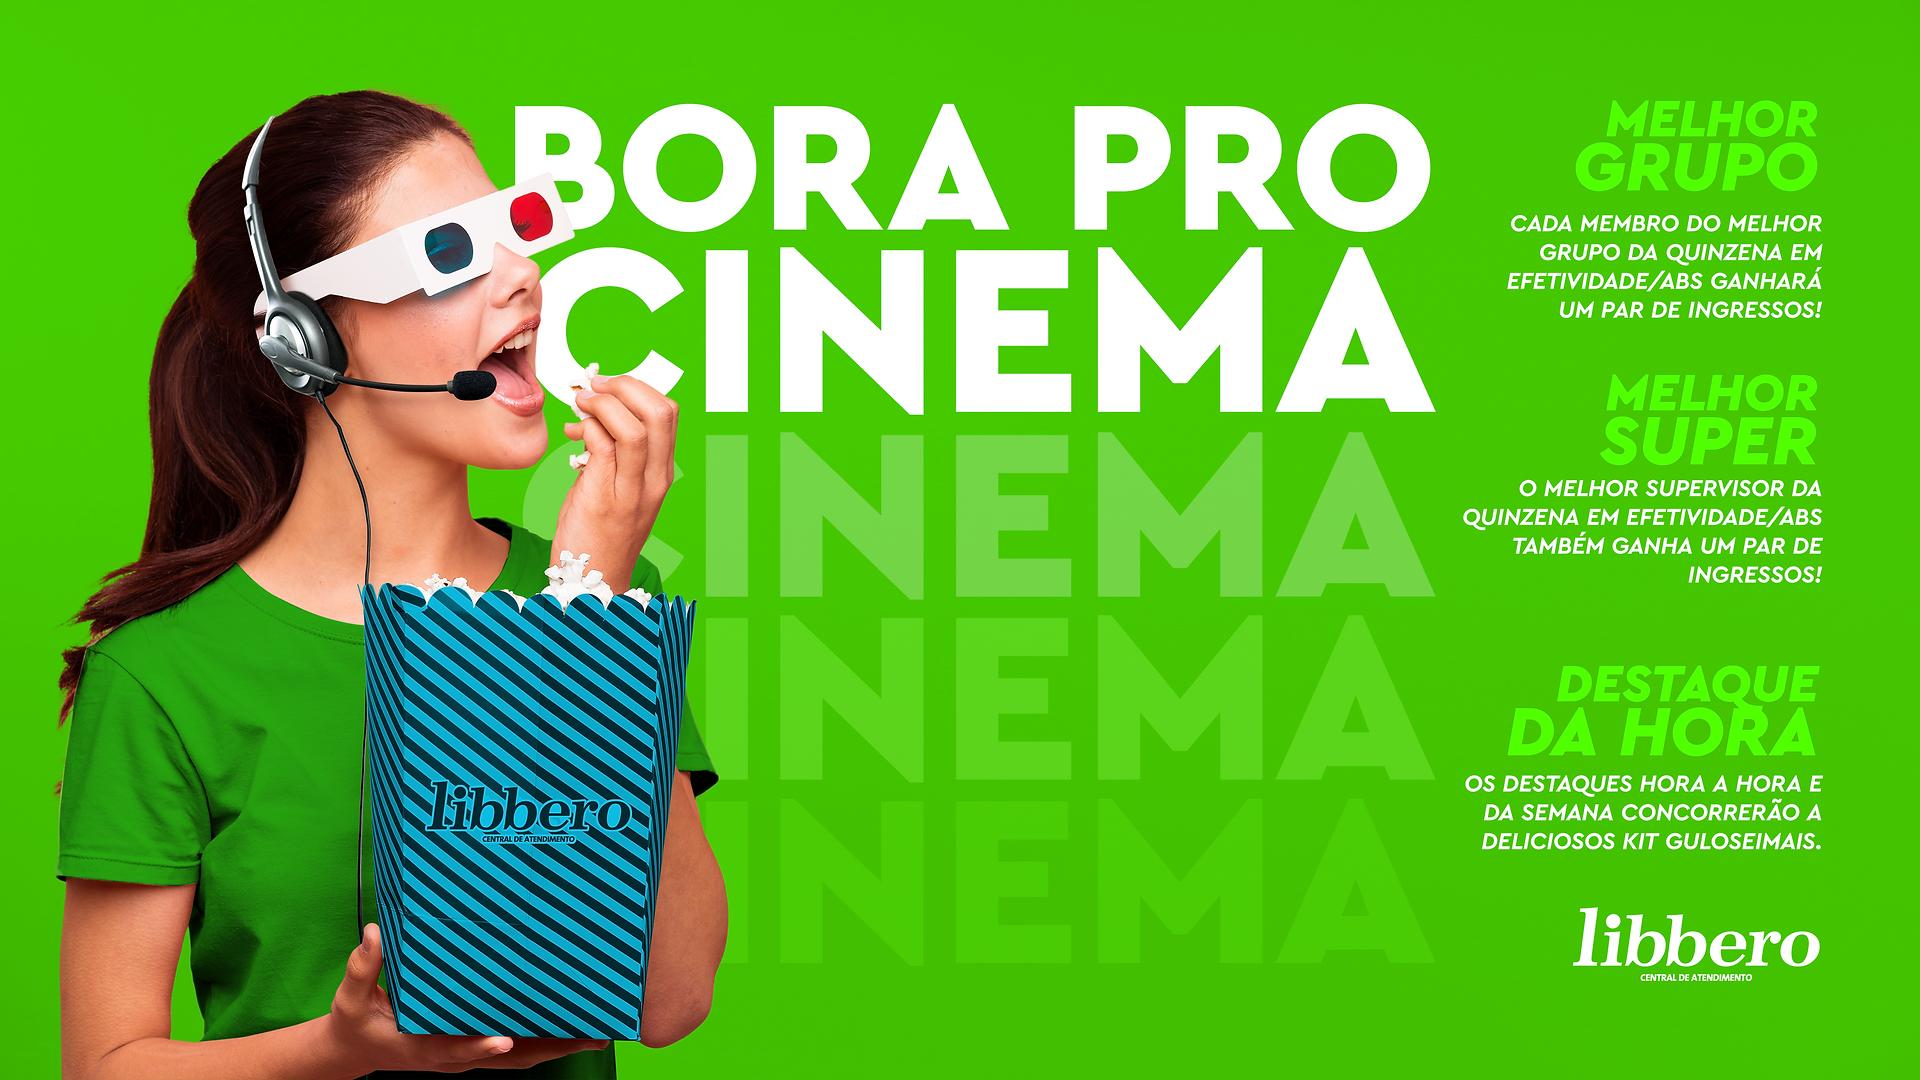 Bora pro Cinema